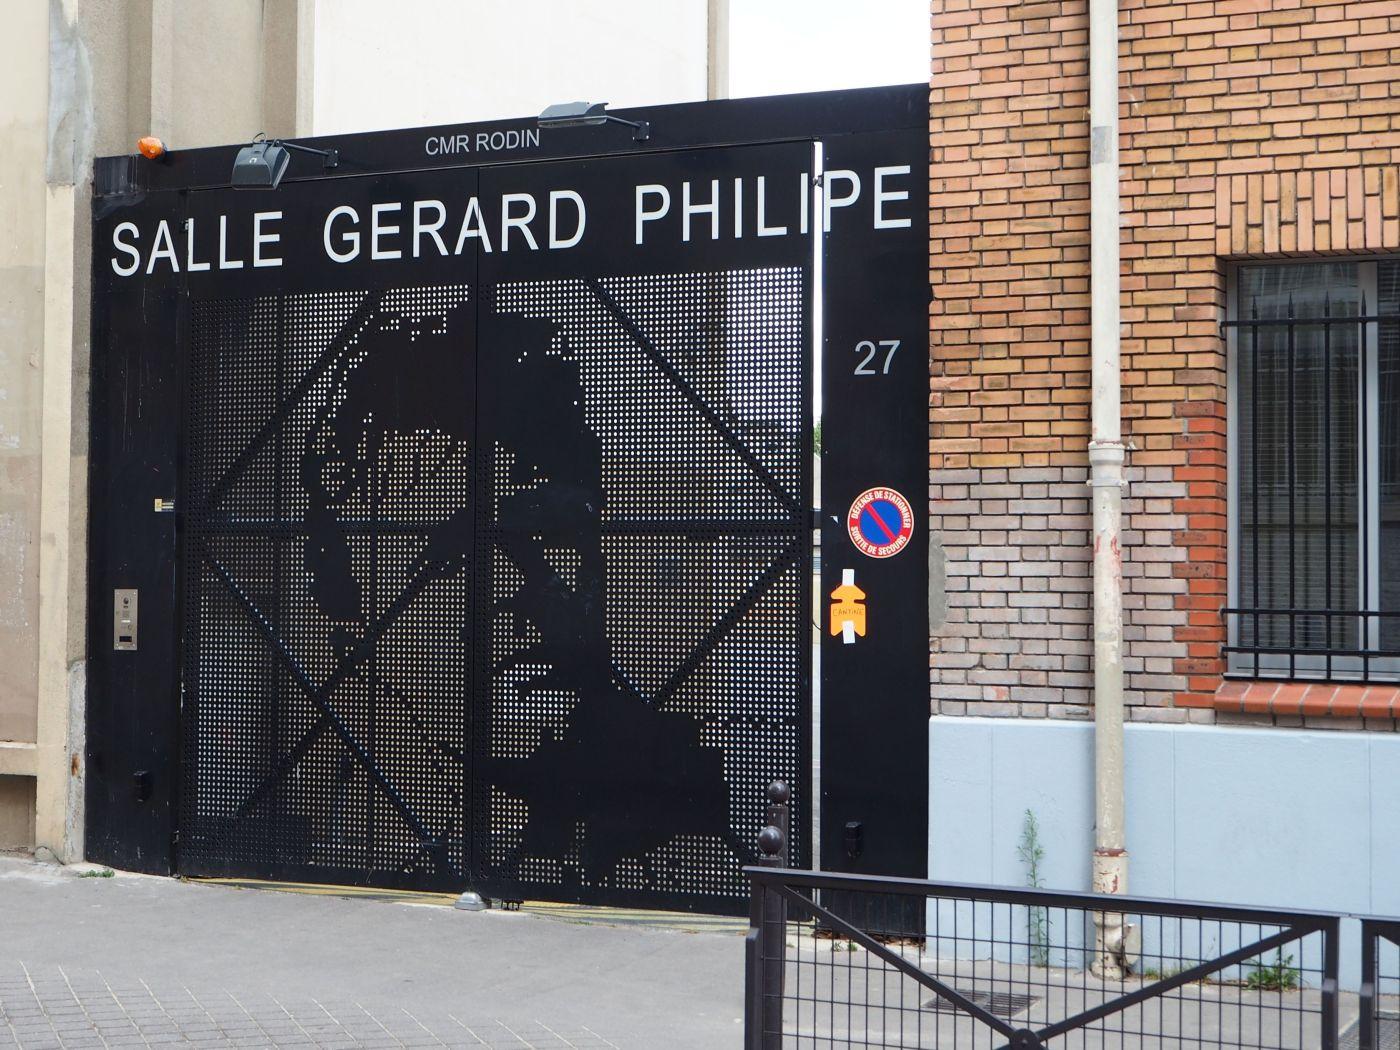 salle gerard philipe paris 13 entrée